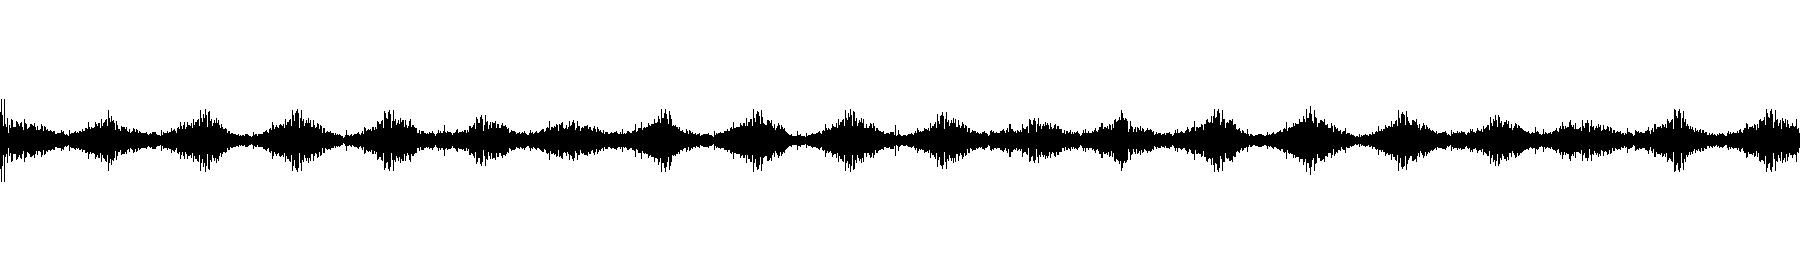 pth synth 11